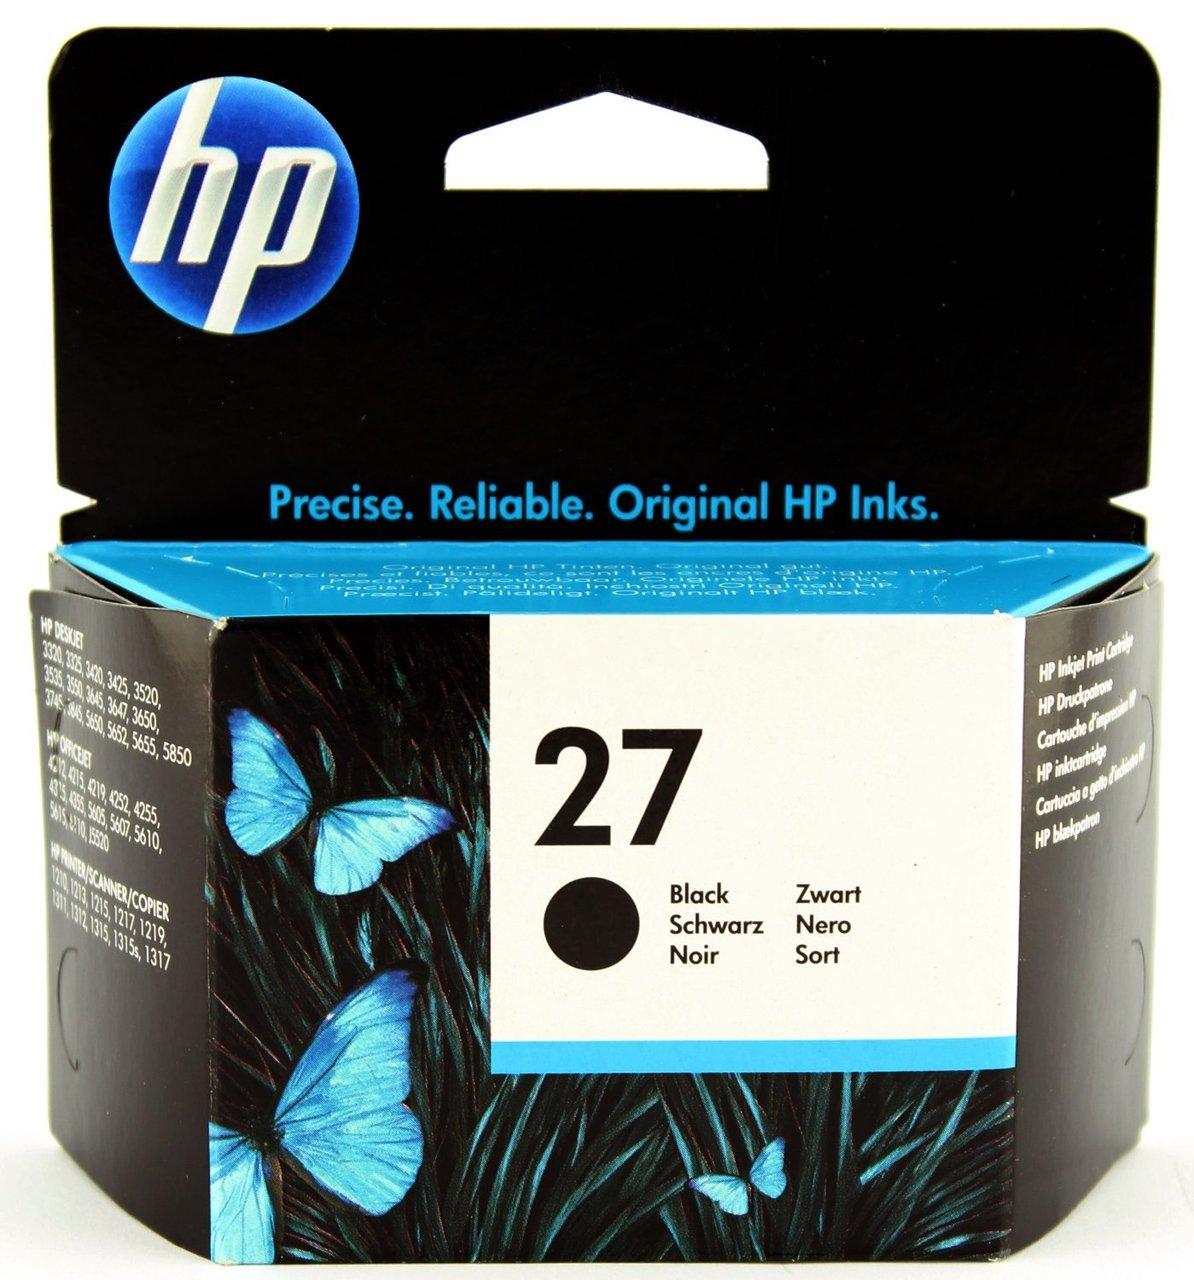 HP 27 - Black Inkjet Print Cartridge (C8727AE)